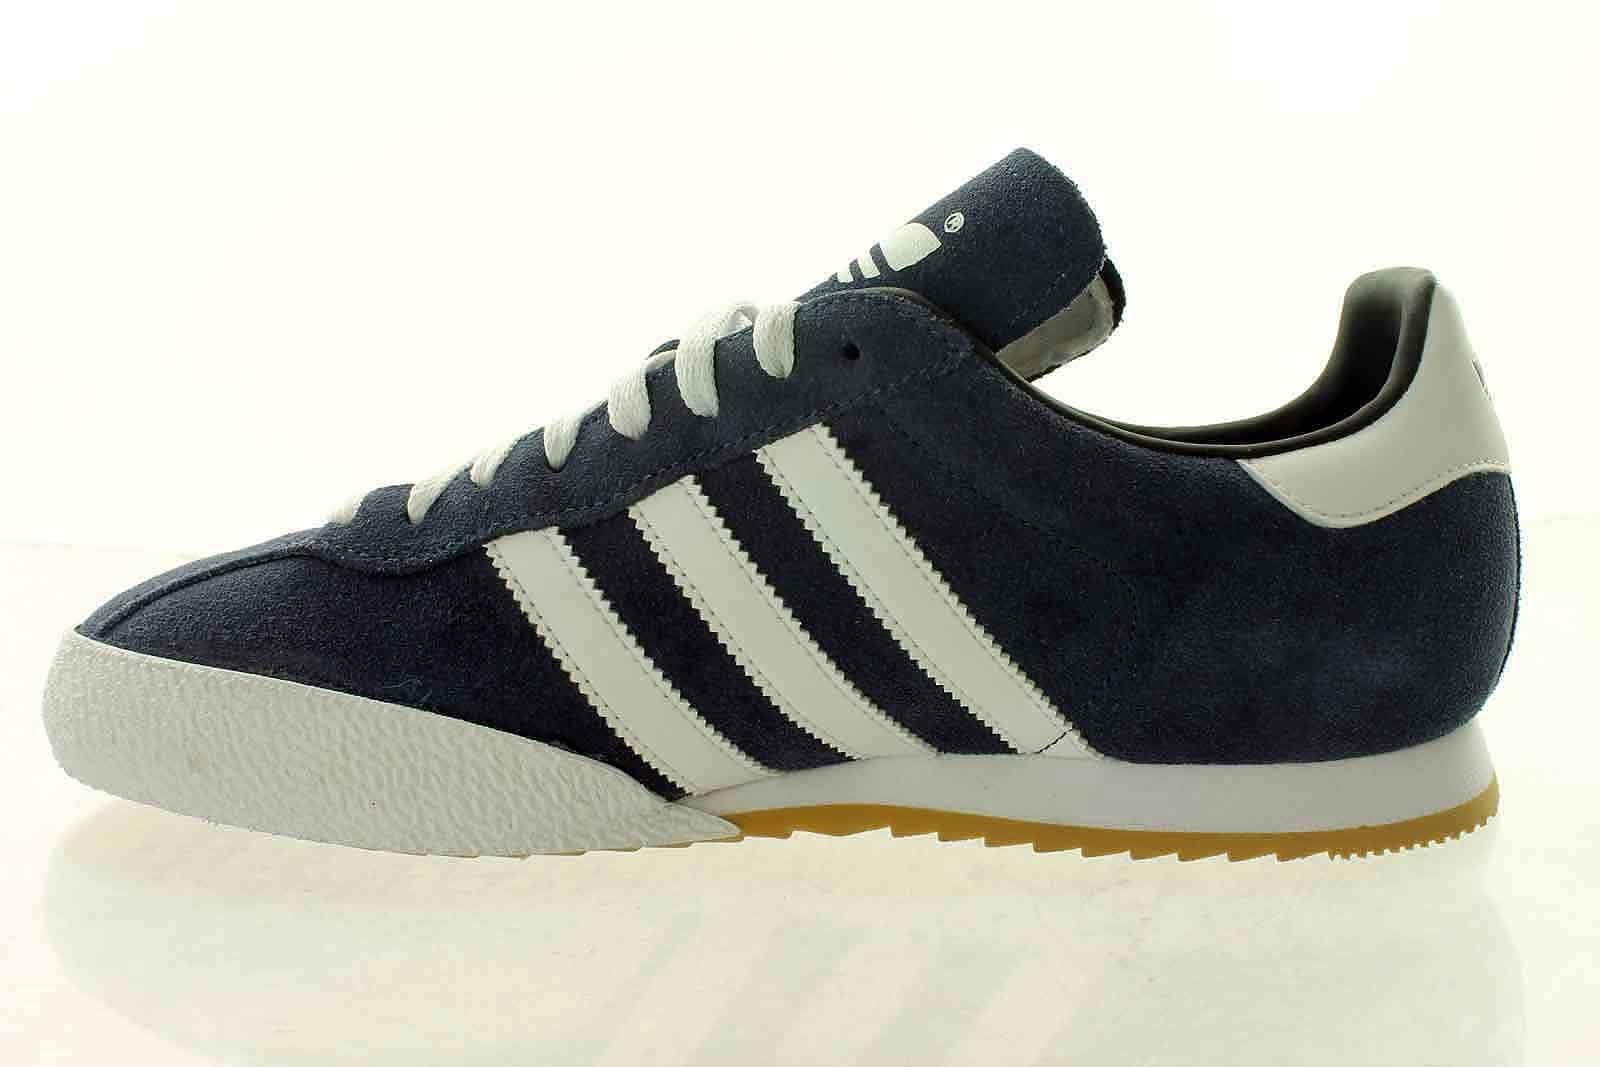 Adidas Nizza Trainers in blanc & & blanc vert - canvas pump rubber toe cap 351a7b